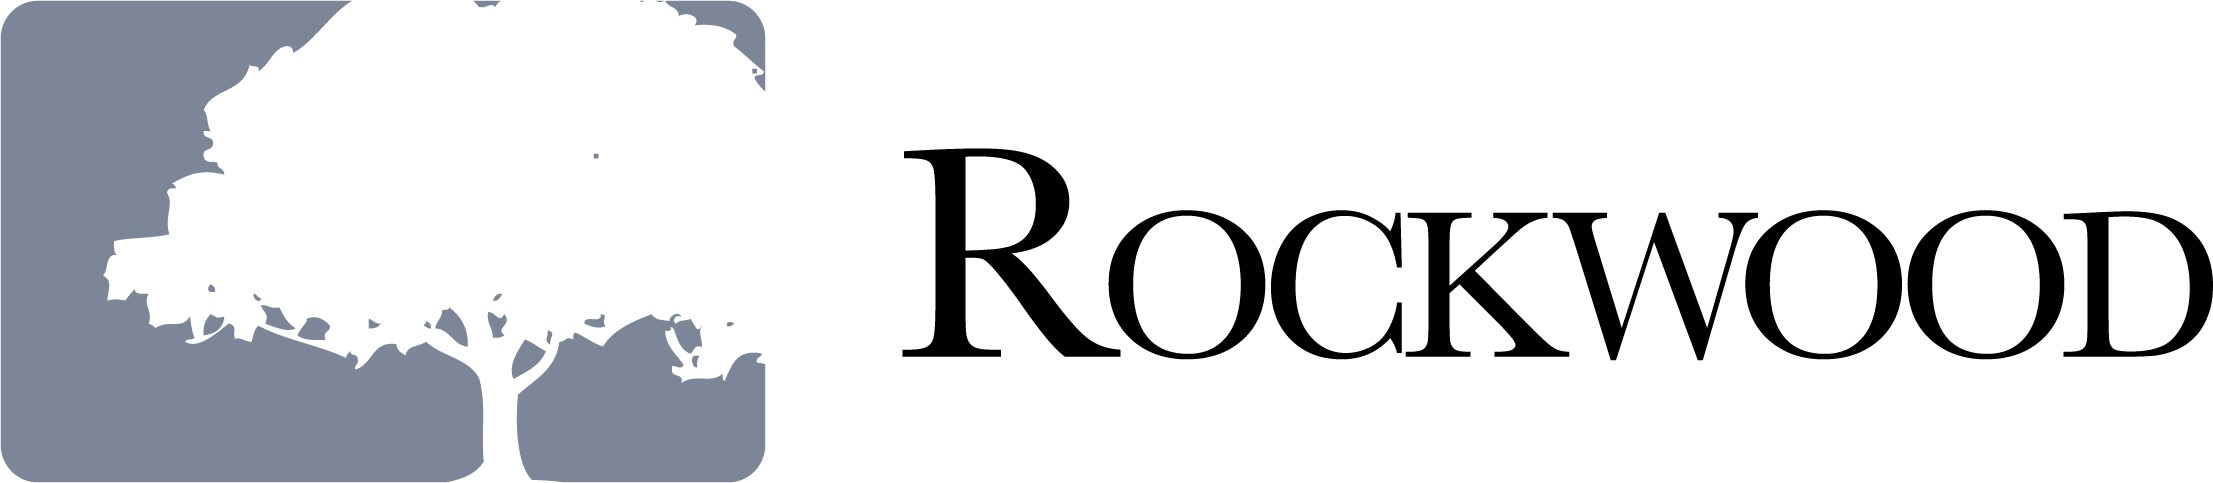 new-rockwood-logo-gray